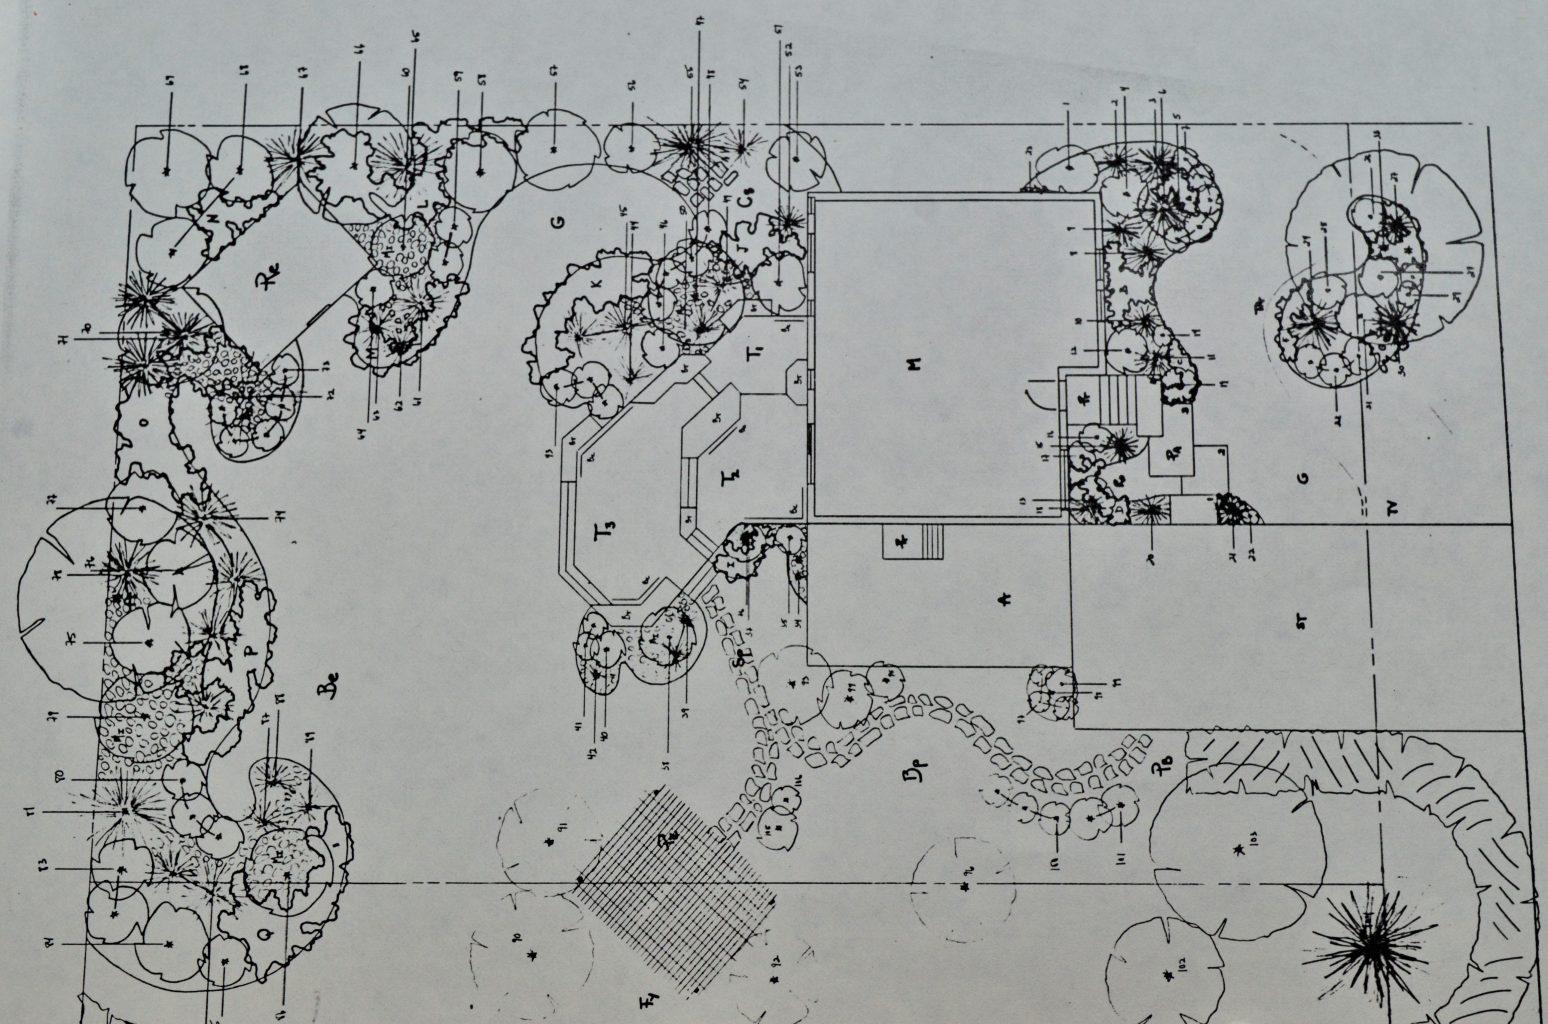 Plani-Décor-Aménagement paysager-Plan 1